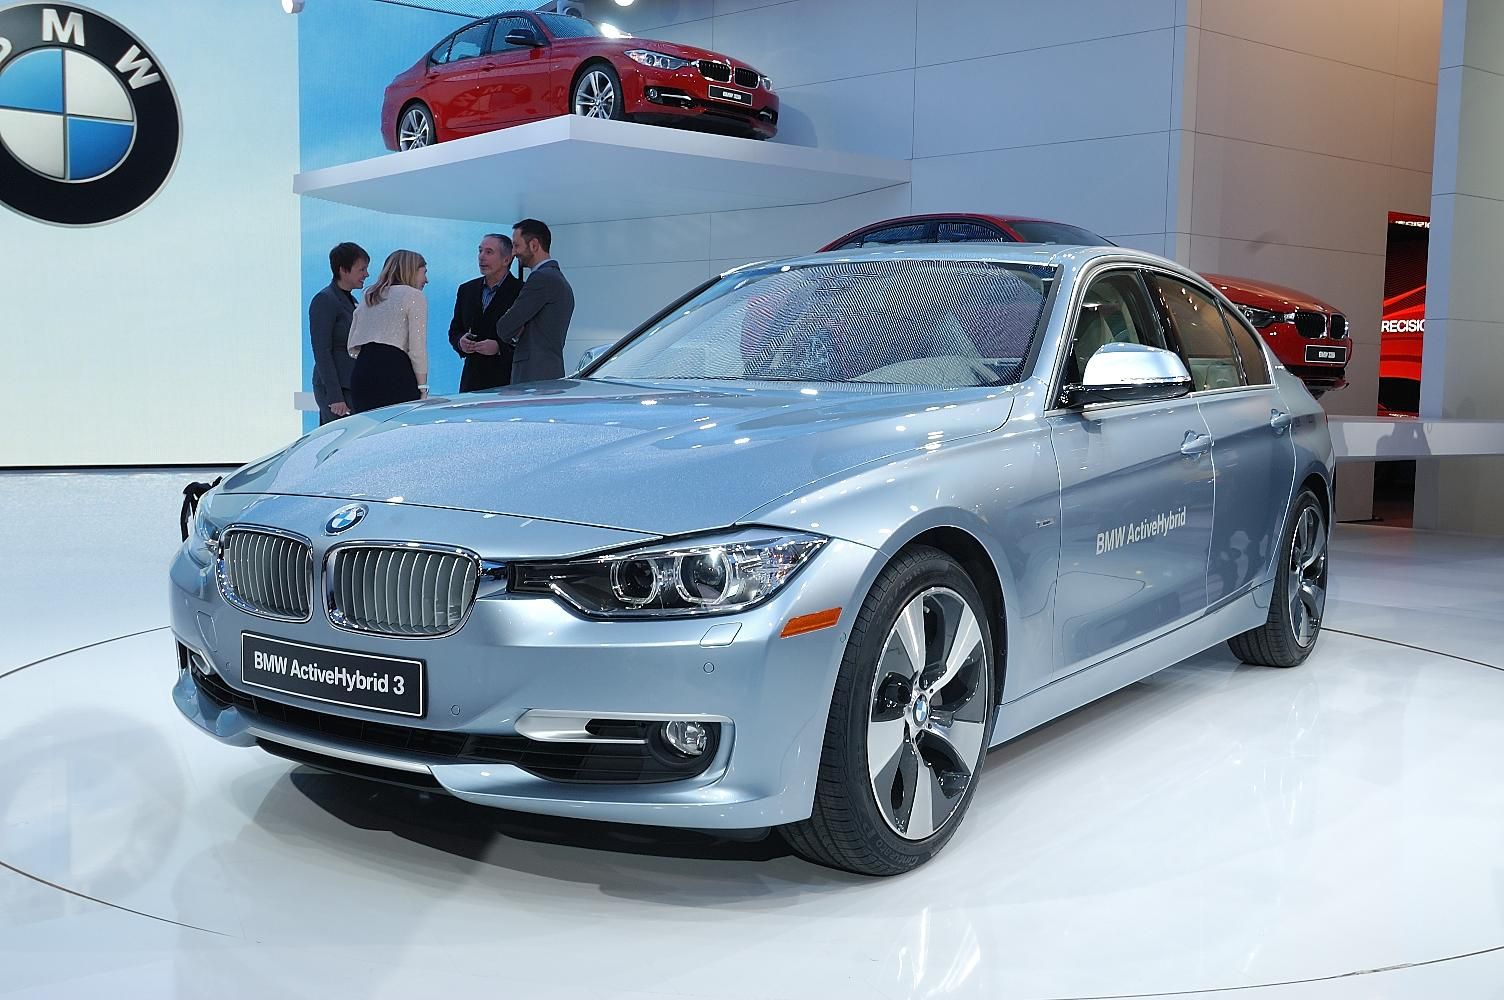 BMW ActiveHybrid 3 NAIAS 2012 2